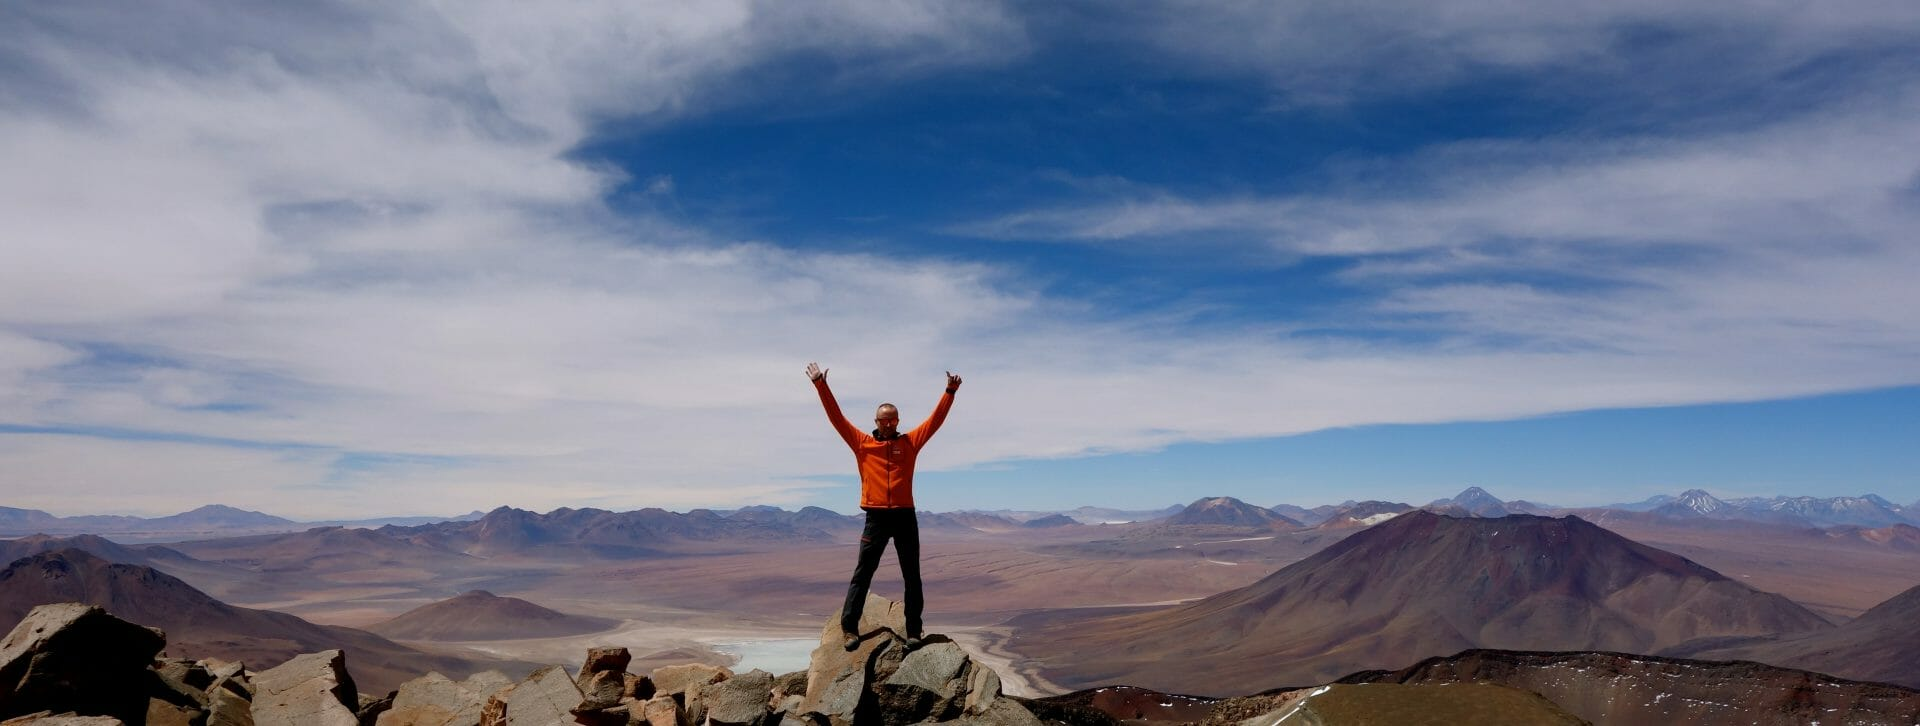 Sairecabor - 6.048 moh